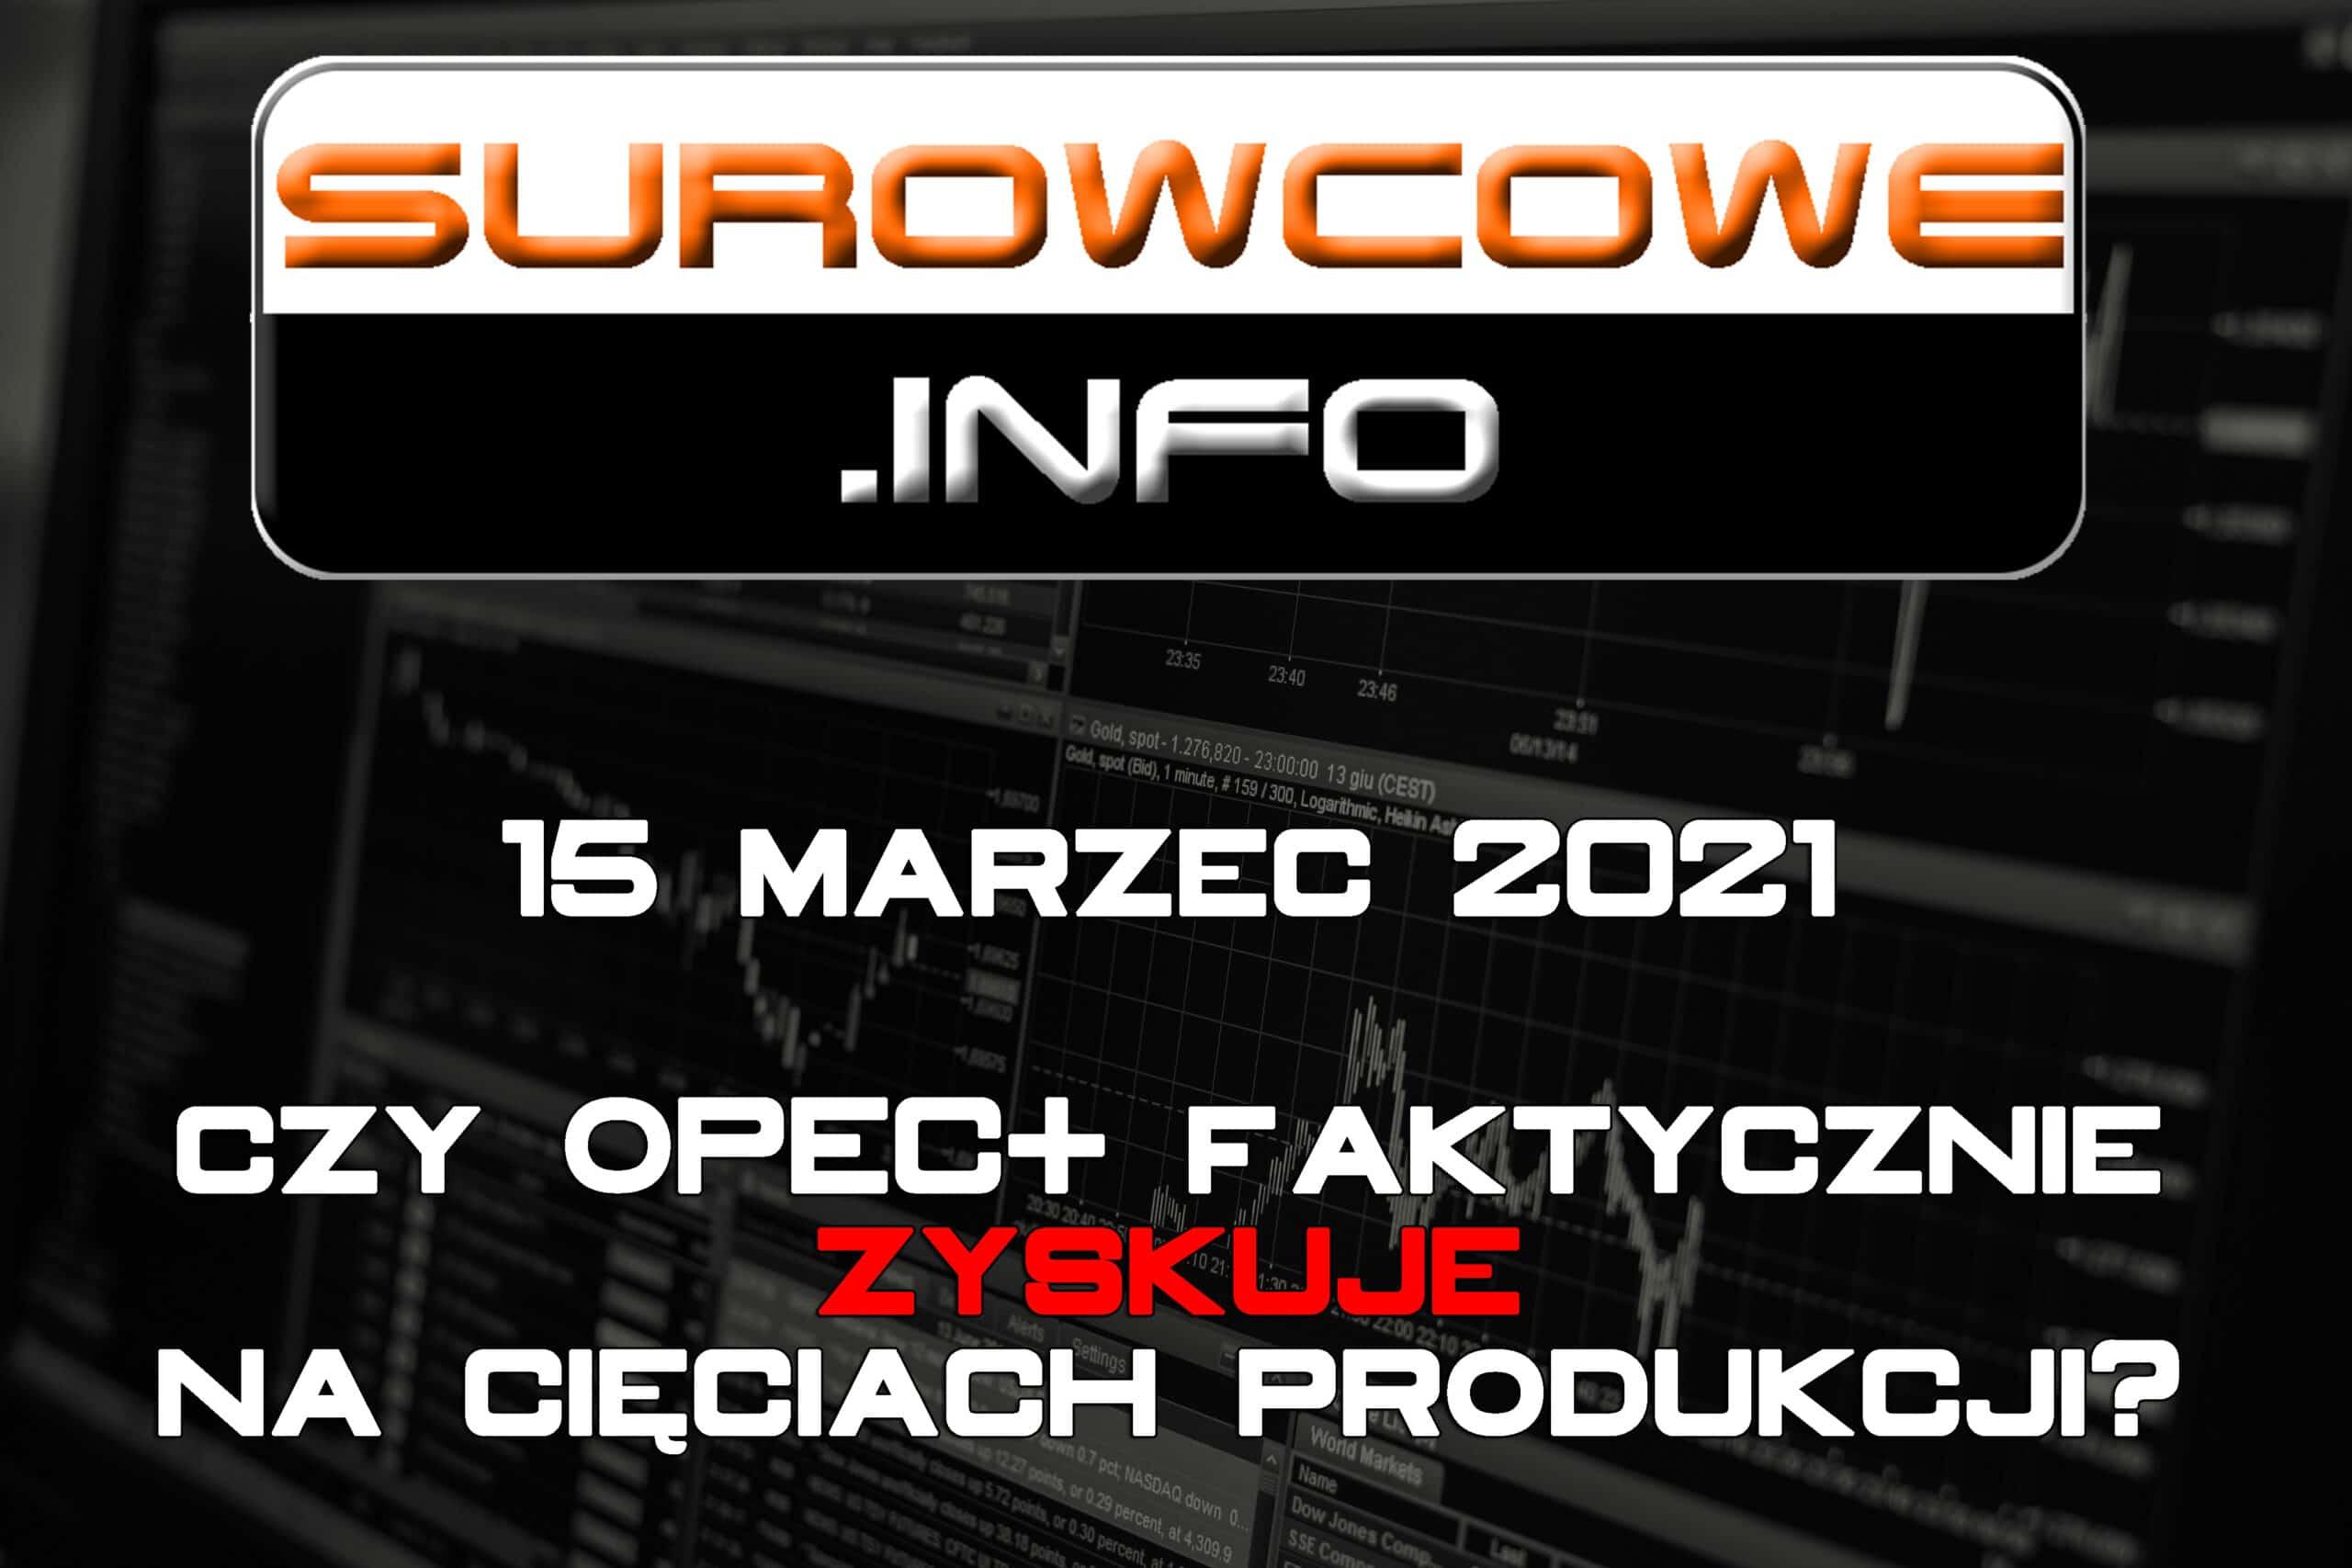 Surowcowe.info 15 marzec 2021